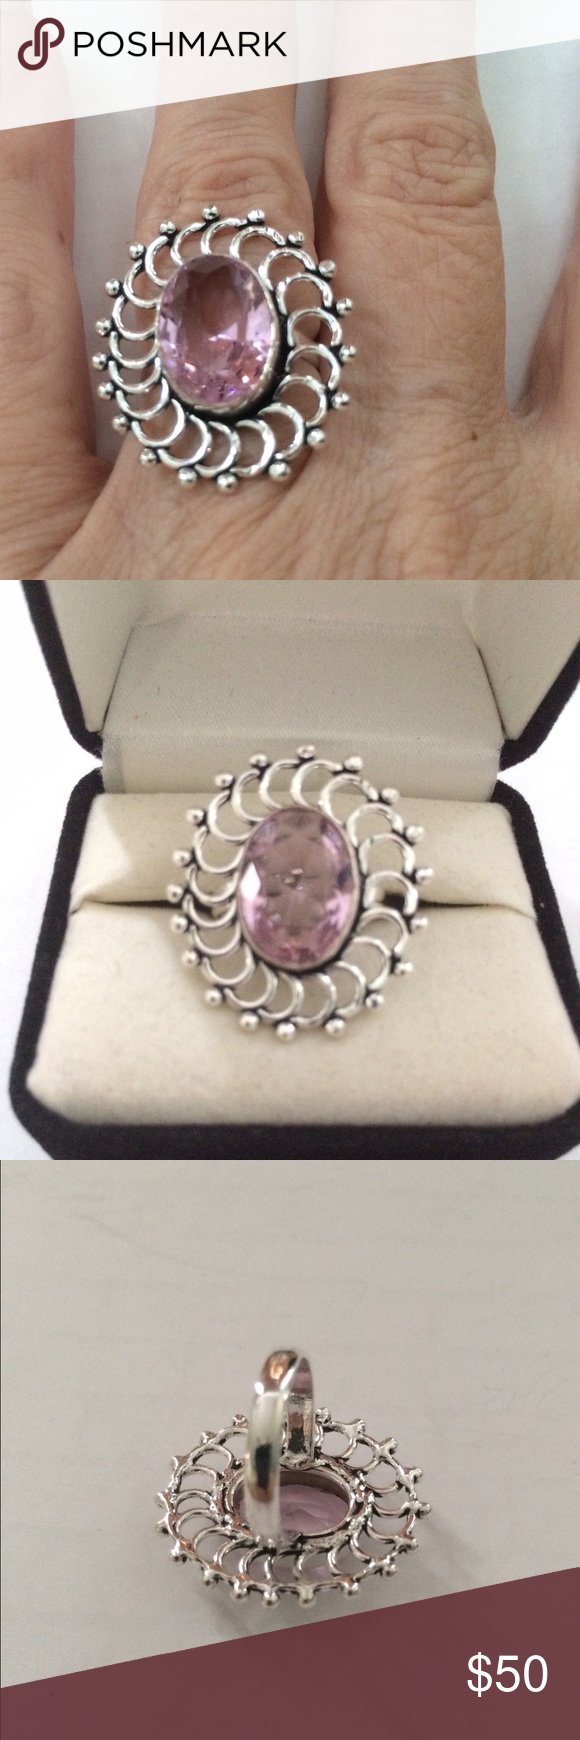 🎀STERLING SILVER 🎀 HANDMADE 🎀 PINK TOPAZ RING Pretty Pink Topaz Ring size 6 in a Handmade Sterling Silver Setting Handmade Jewelry Rings